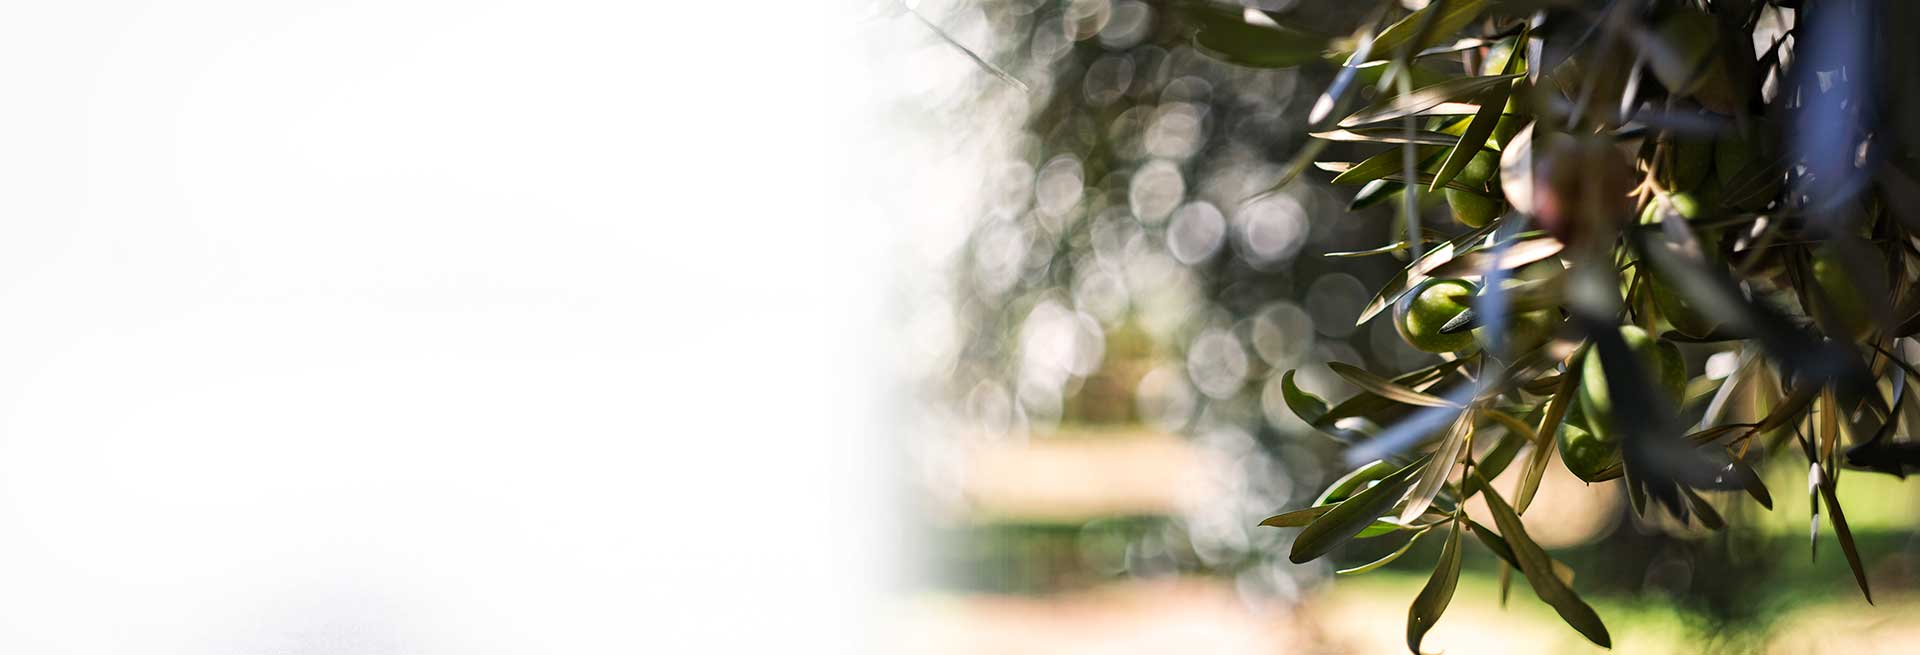 Miraglia Olive Cultivar